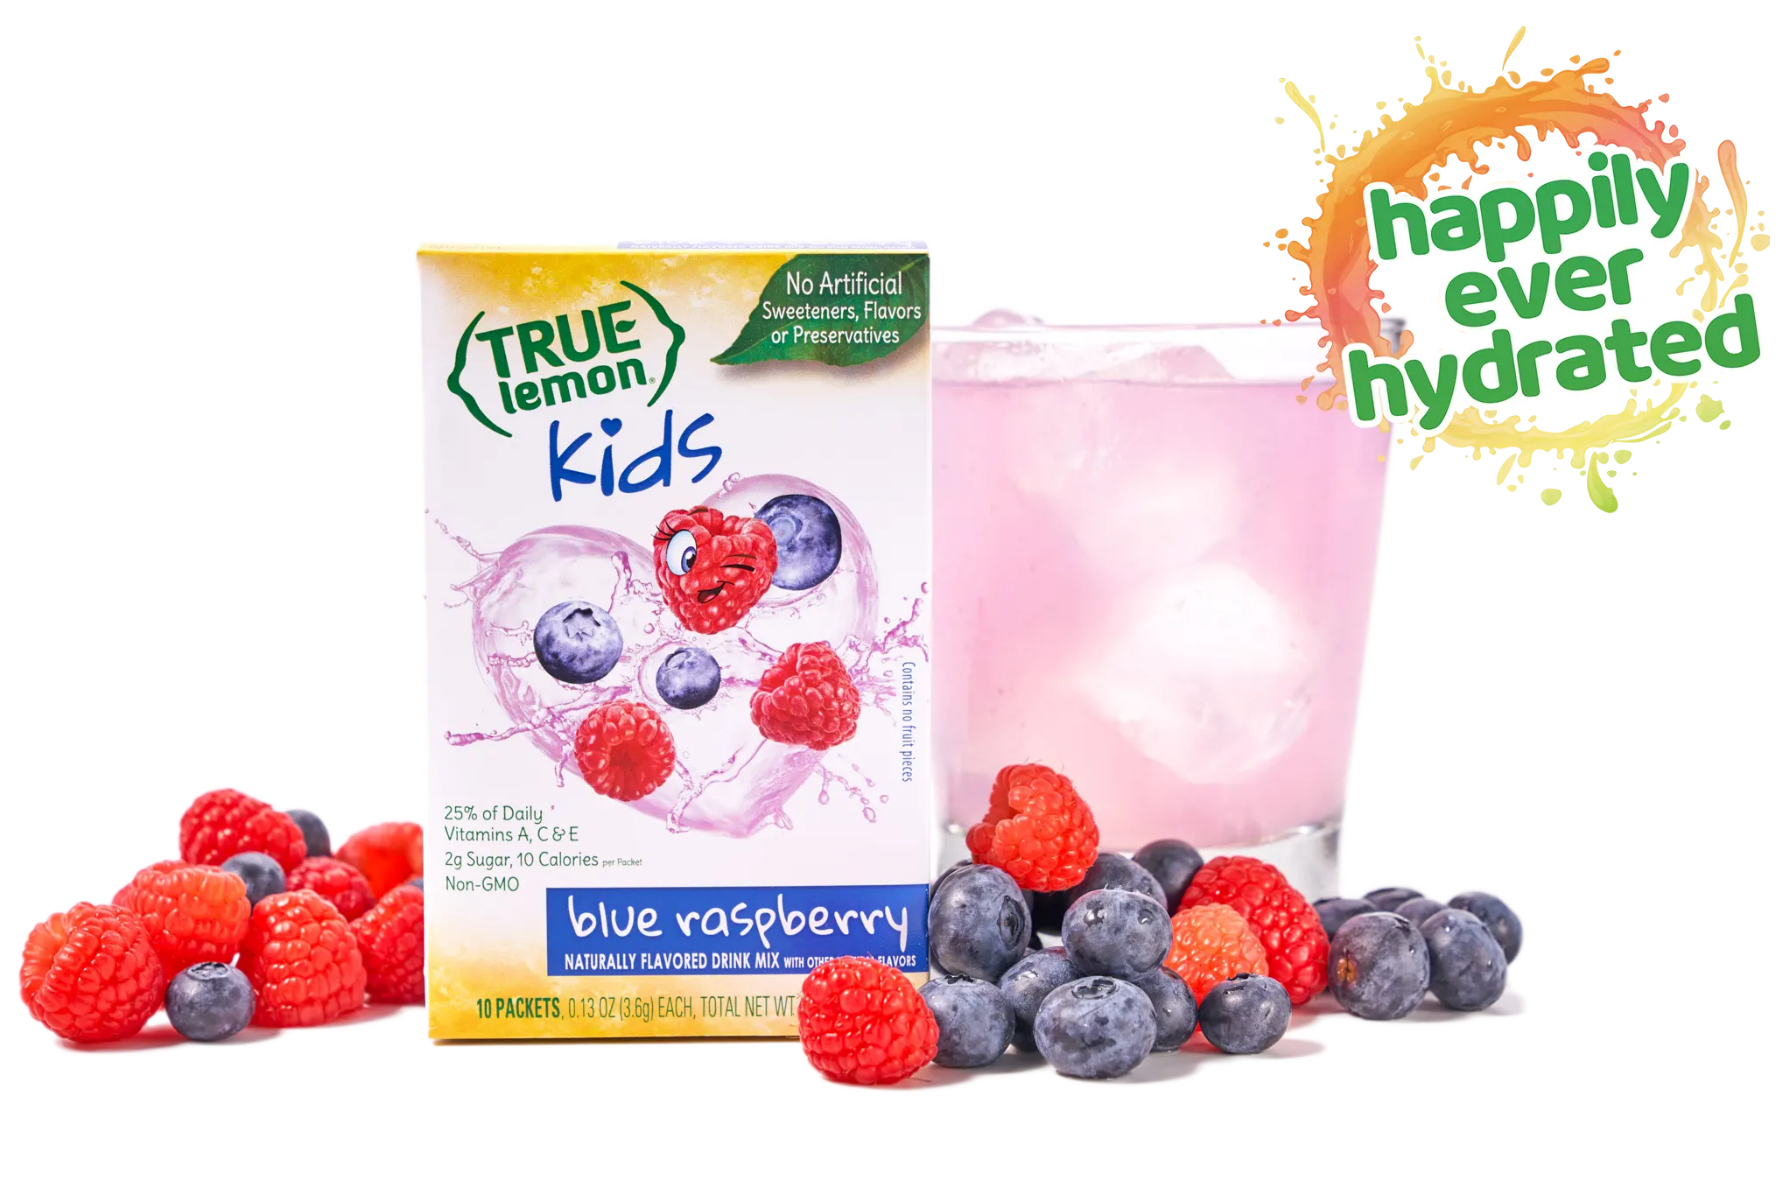 True Lemon Kids Blue Raspberry